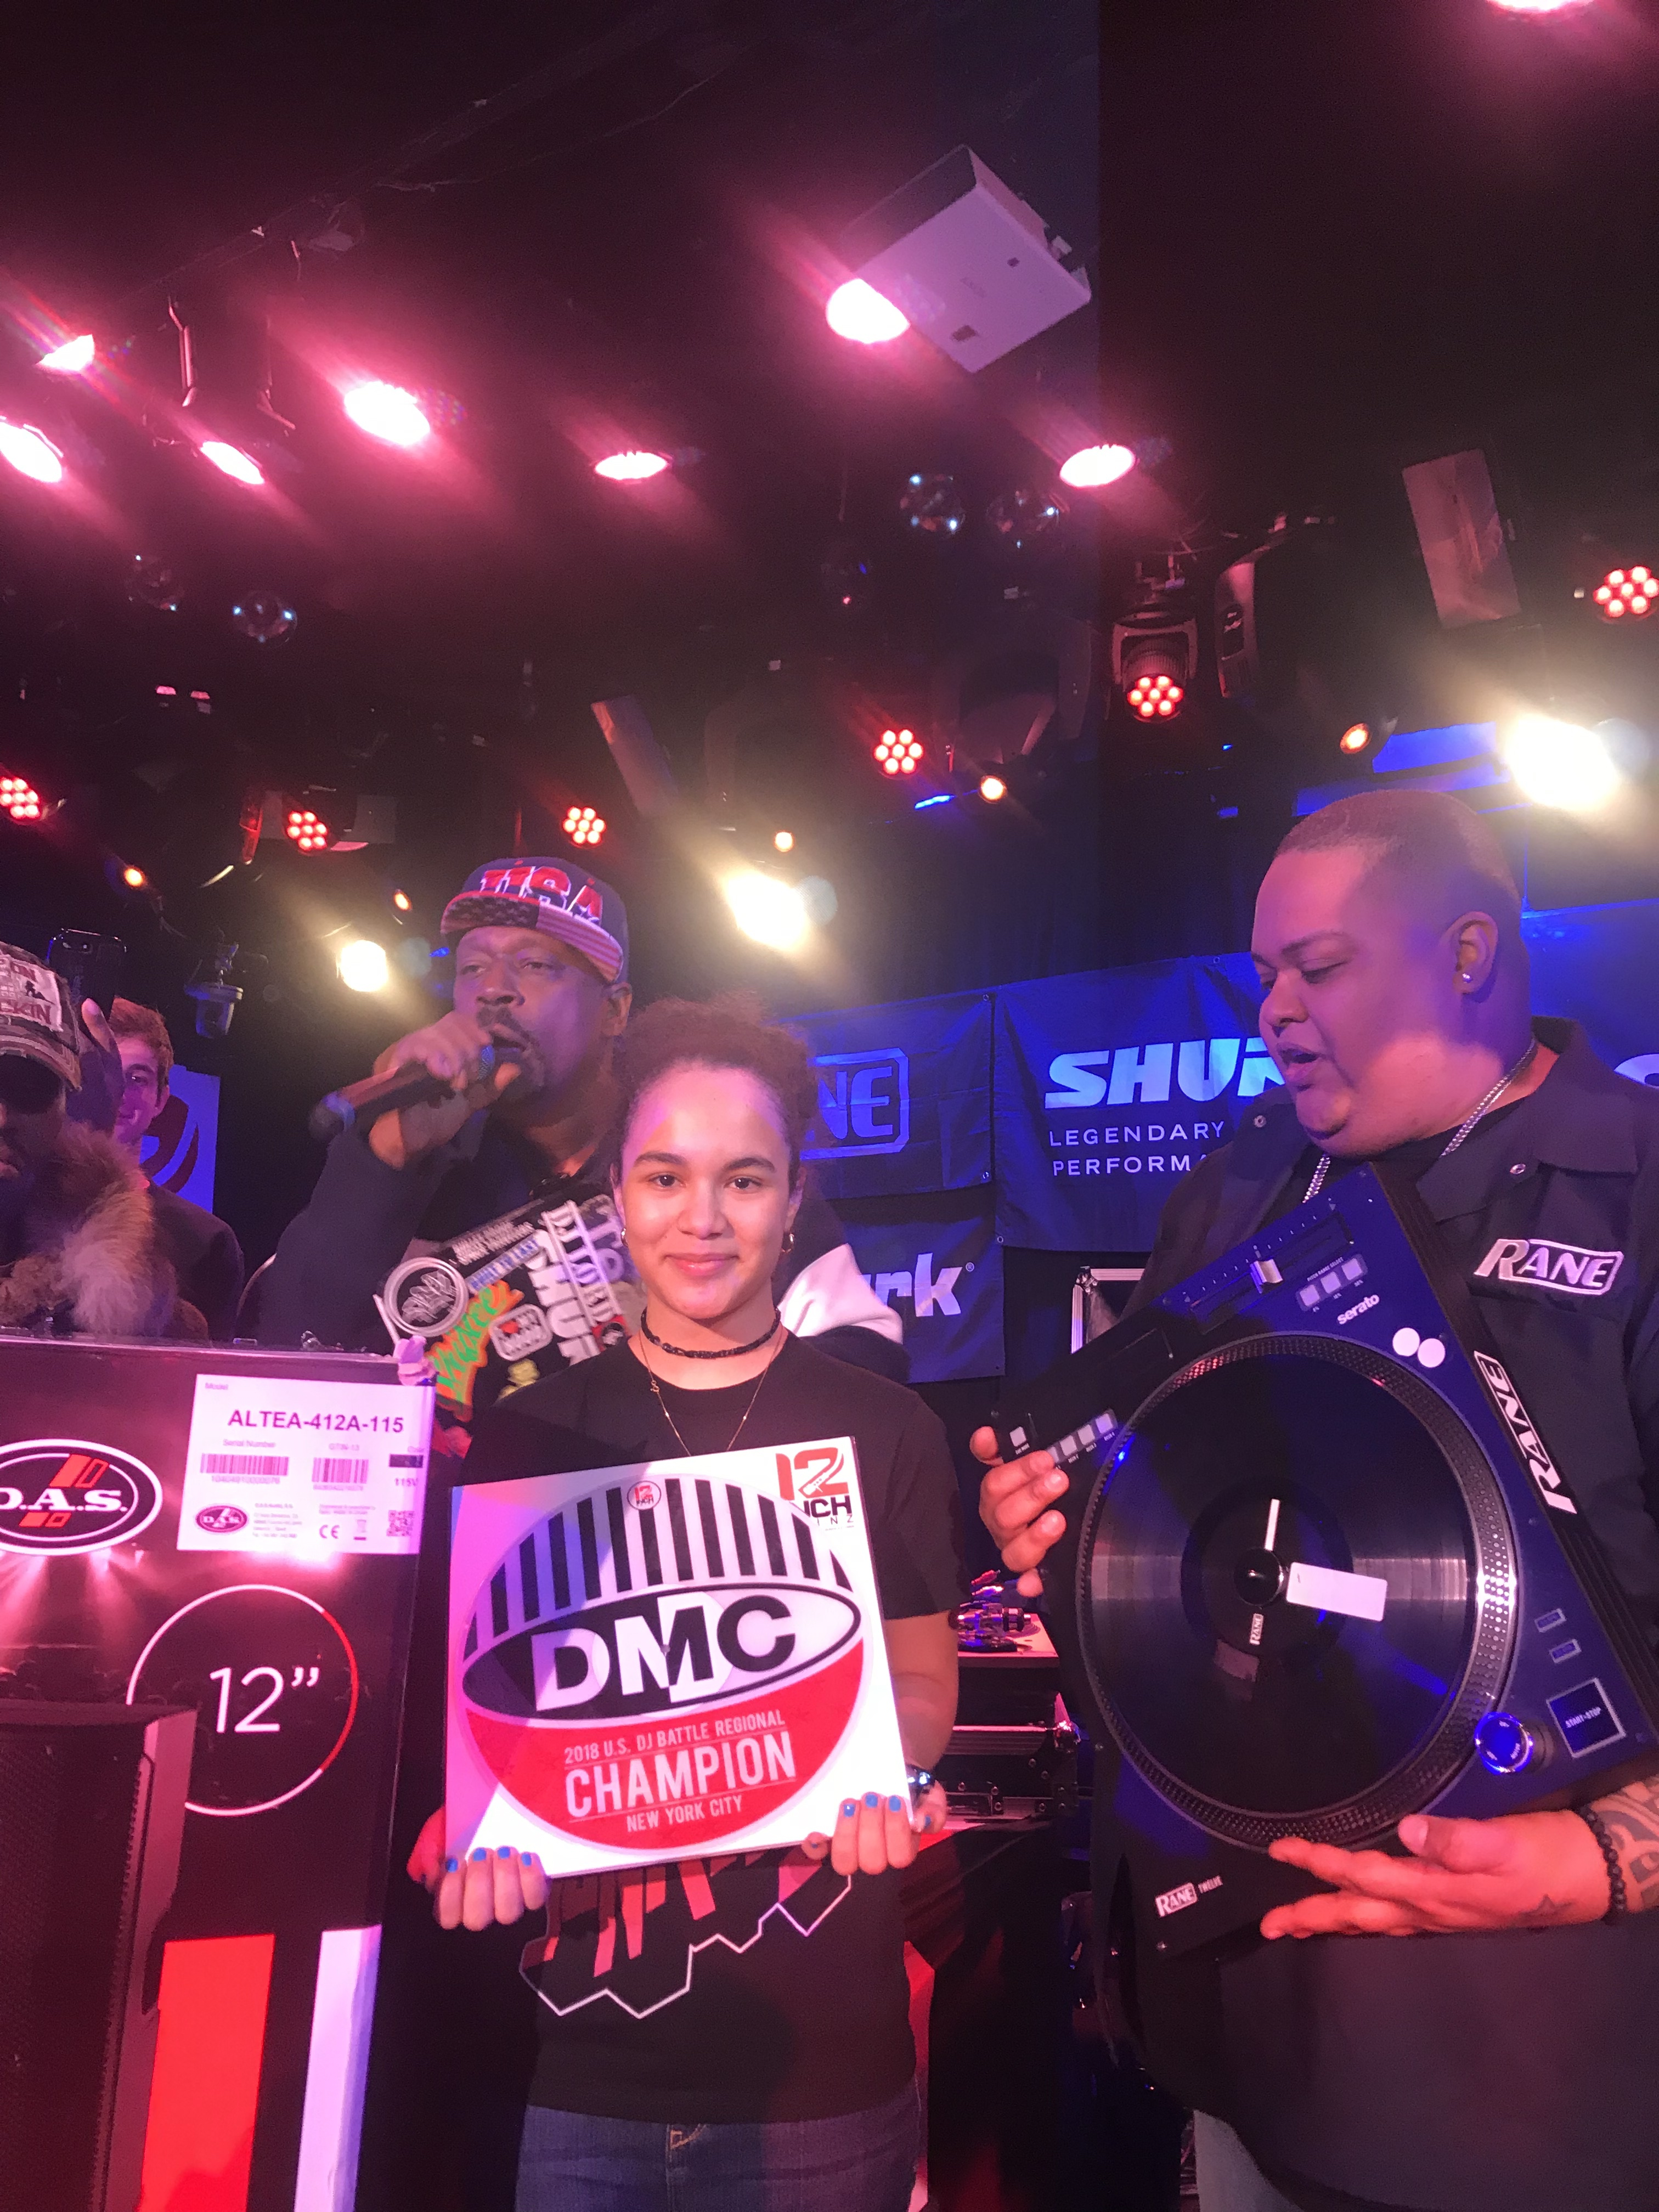 11-Year-Old DJ Kool Flash Wins DMC Regional Competition in NYC